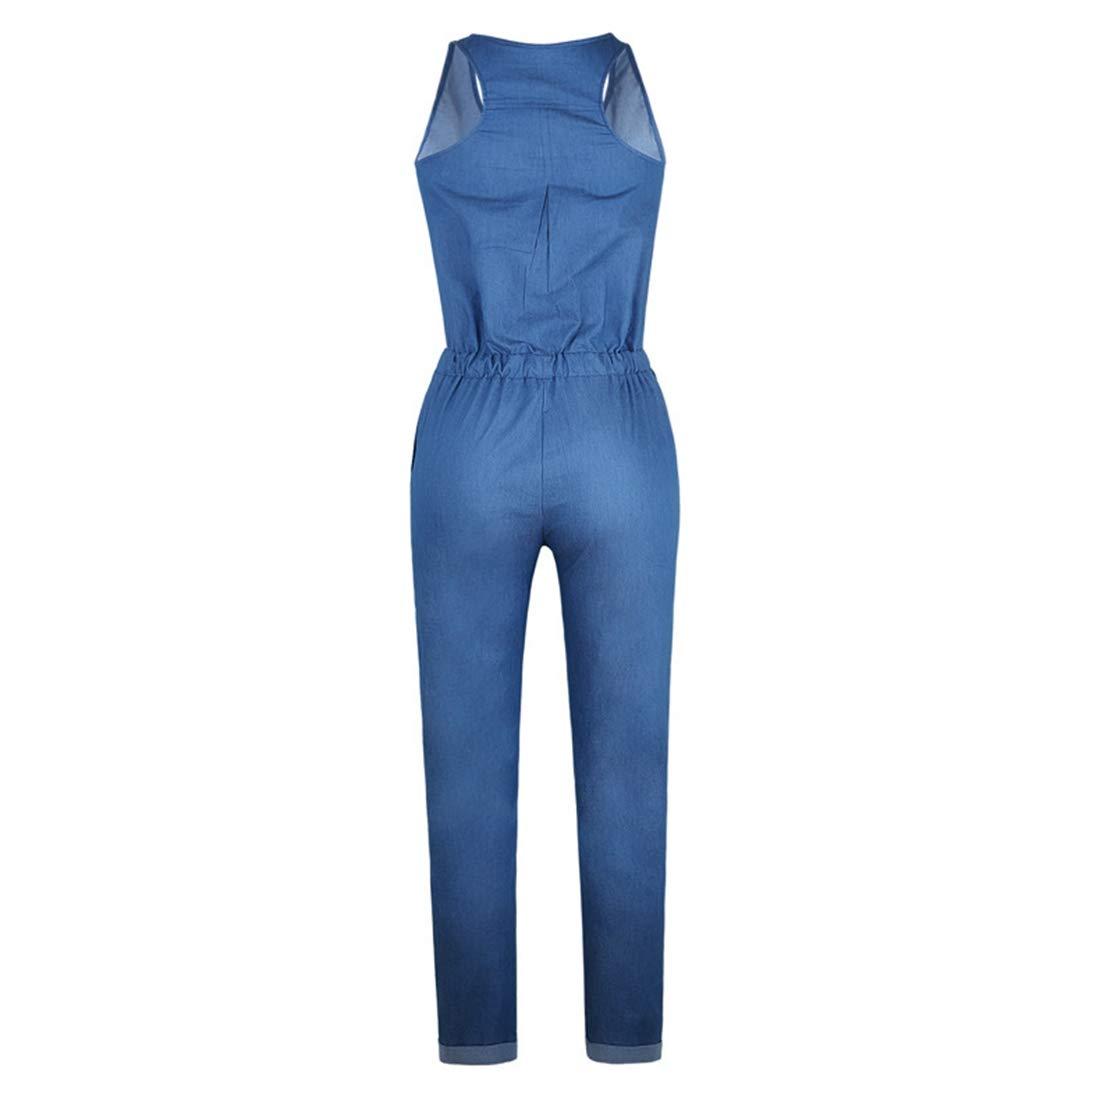 Jsqianchen Botines de Mezclilla con Botones sin Mangas para Mujer Mamelucos Bodysuit con Bolsillo (Color : Deep Blue, Size : S): Amazon.es: Hogar